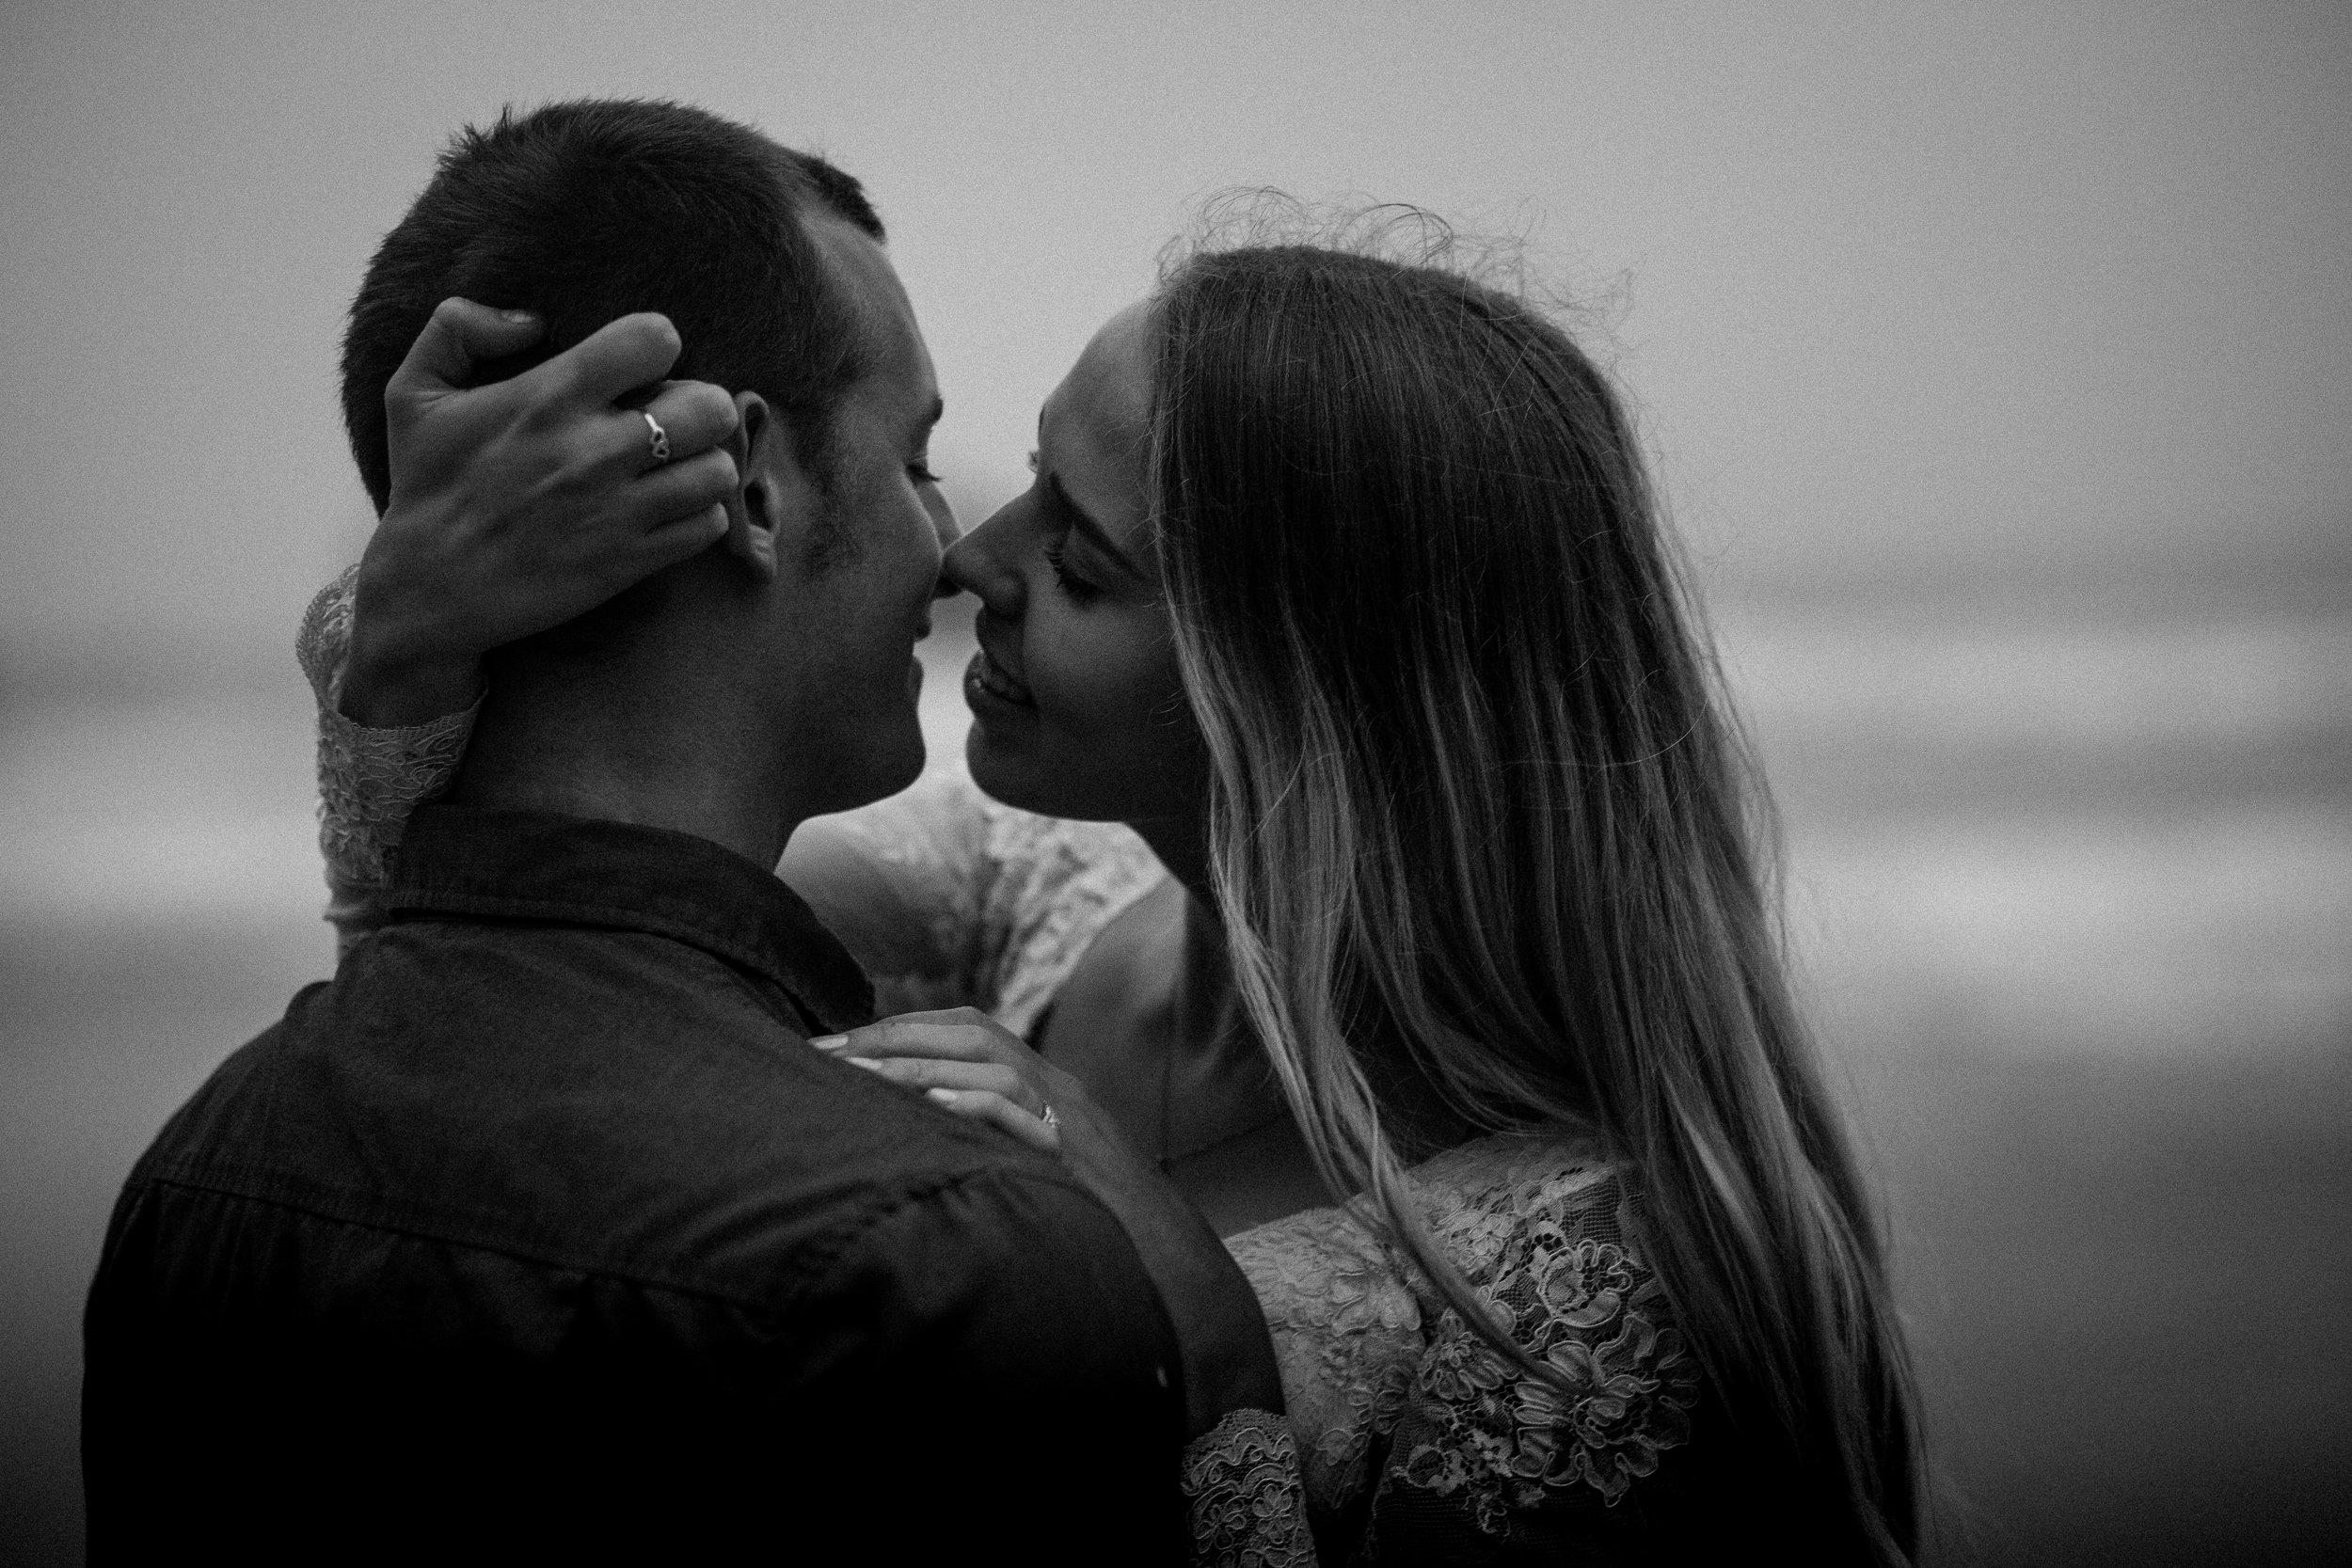 nicole-daacke-photography-ecola-state-park-oregon-elopement-bridal-photos-photographer-for-cannon-beach-elopement-oregon-coast-elopement-photographer-foggy-summer-elopement-cannon-beach-best-adventure-elopement-photographer-5670.jpg